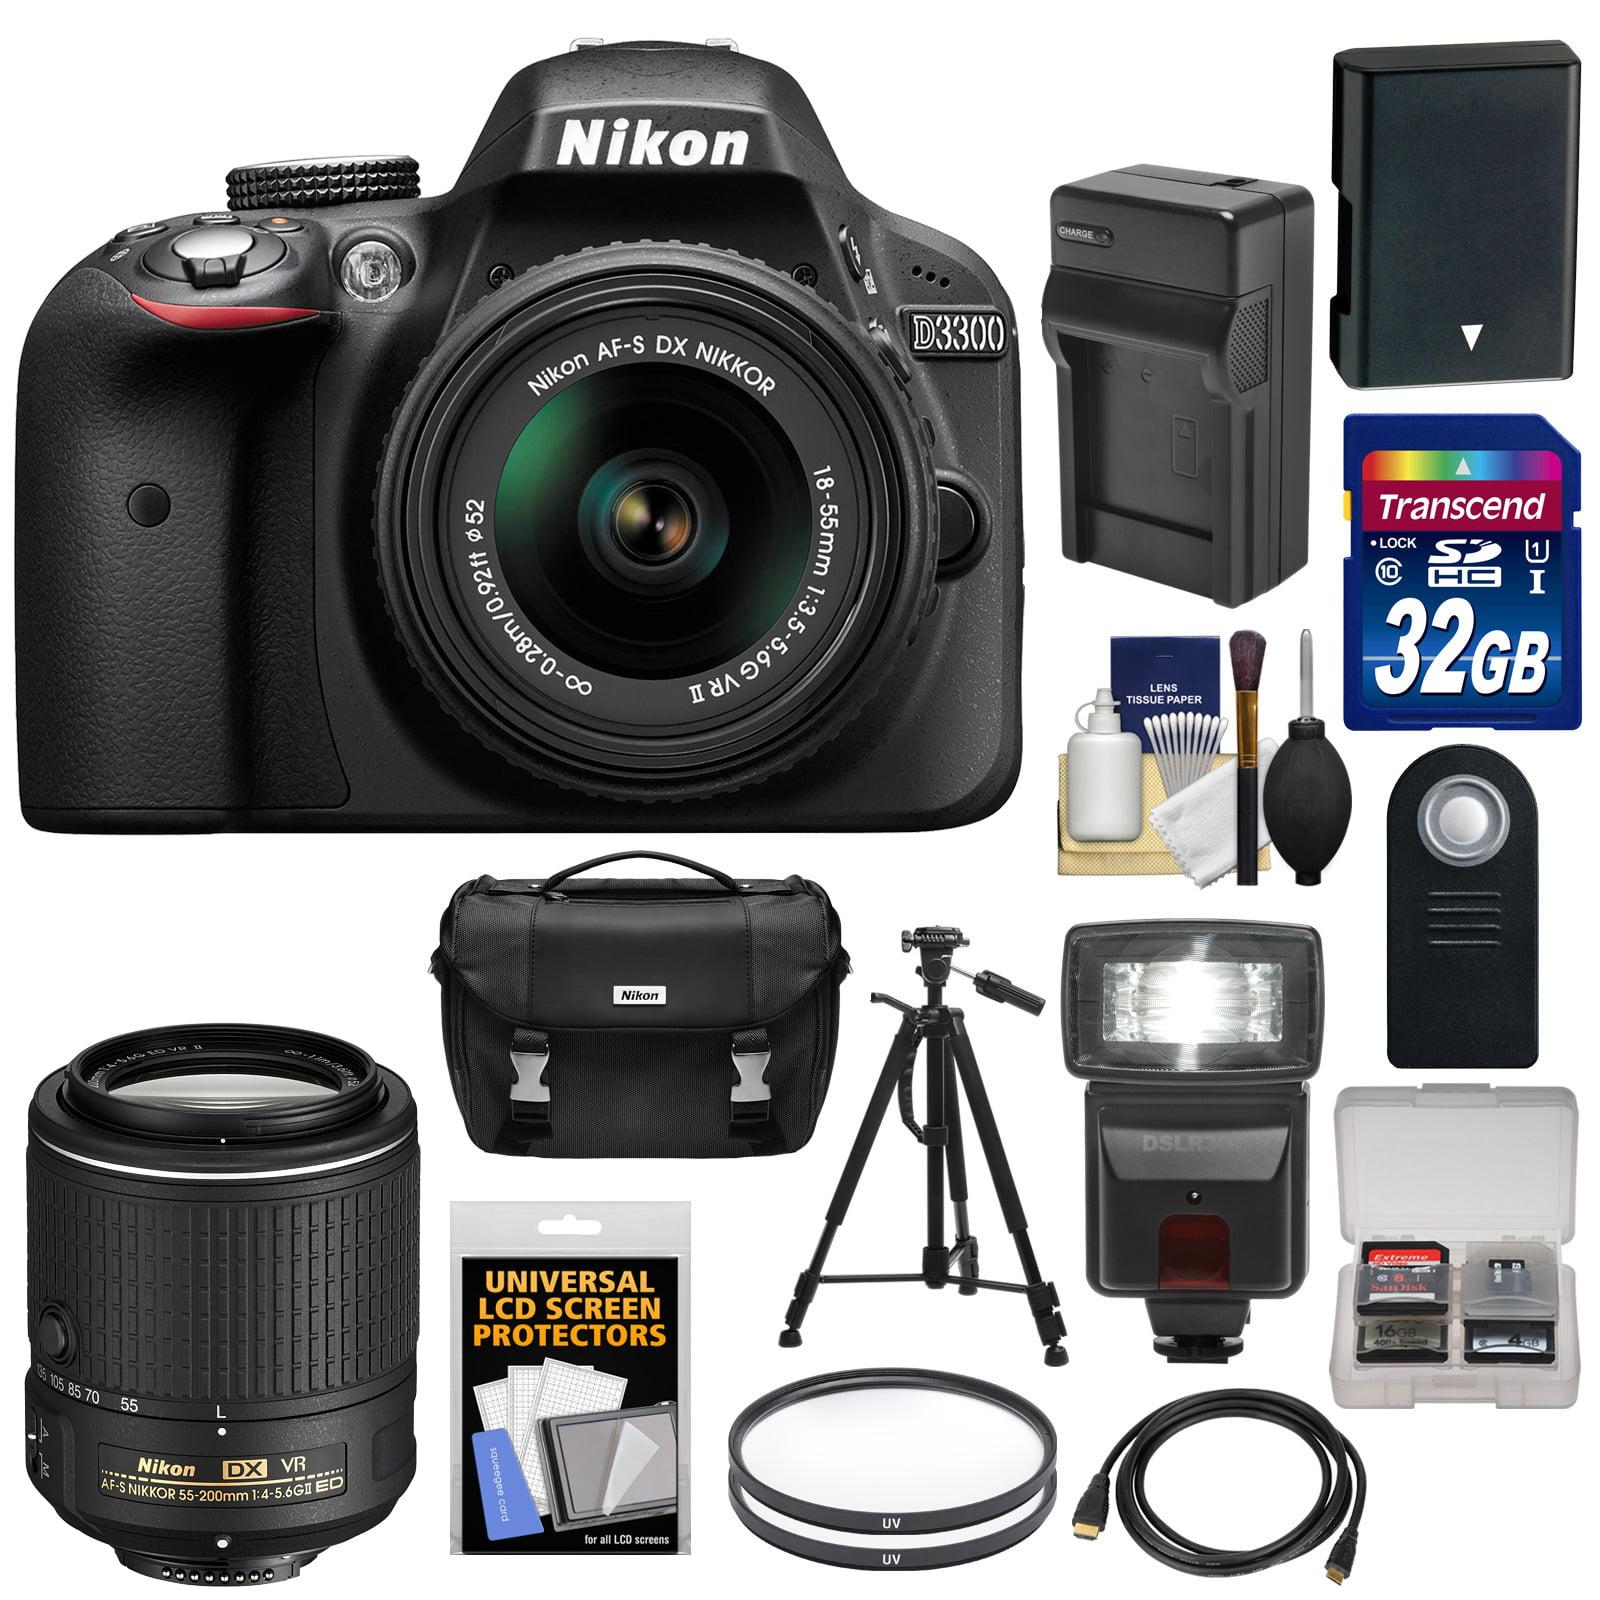 Nikon D3300 Digital SLR Camera & 18-55mm G VR DX II (Black) with 55-200mm VR II Lens + 32GB Card + Battery & Charger + Case + Flash + Tripod Kit